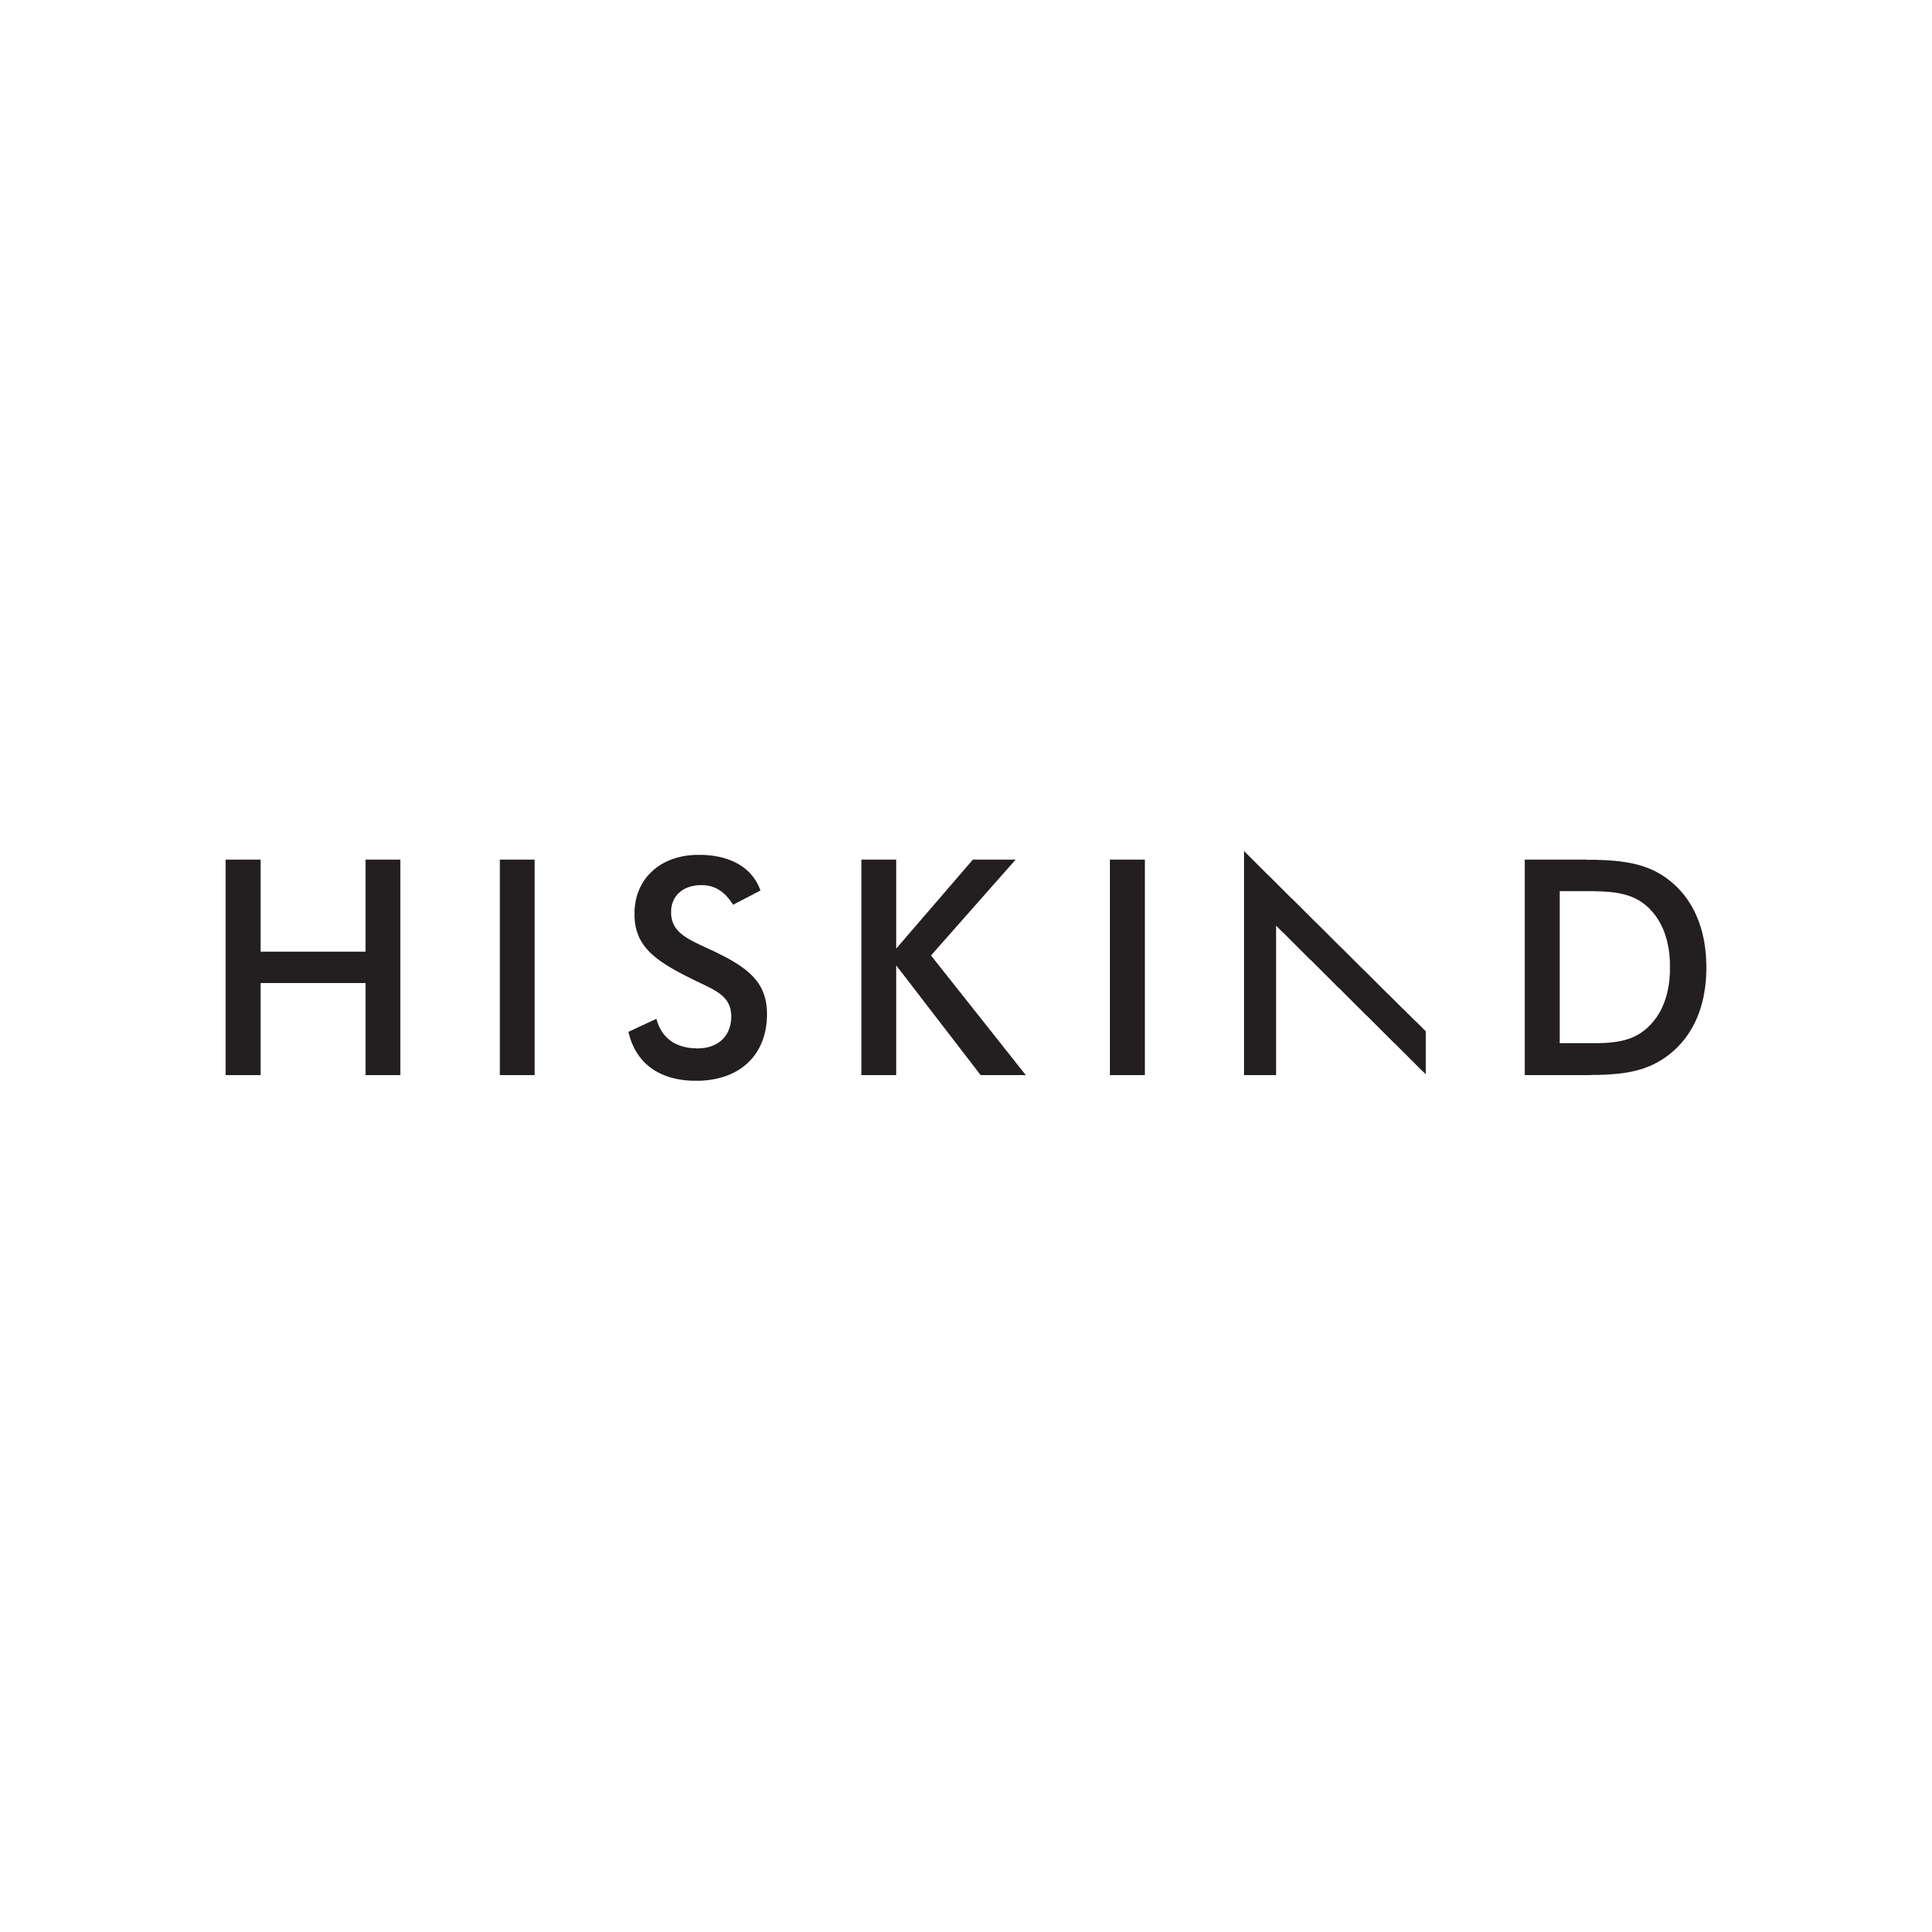 HISKIND